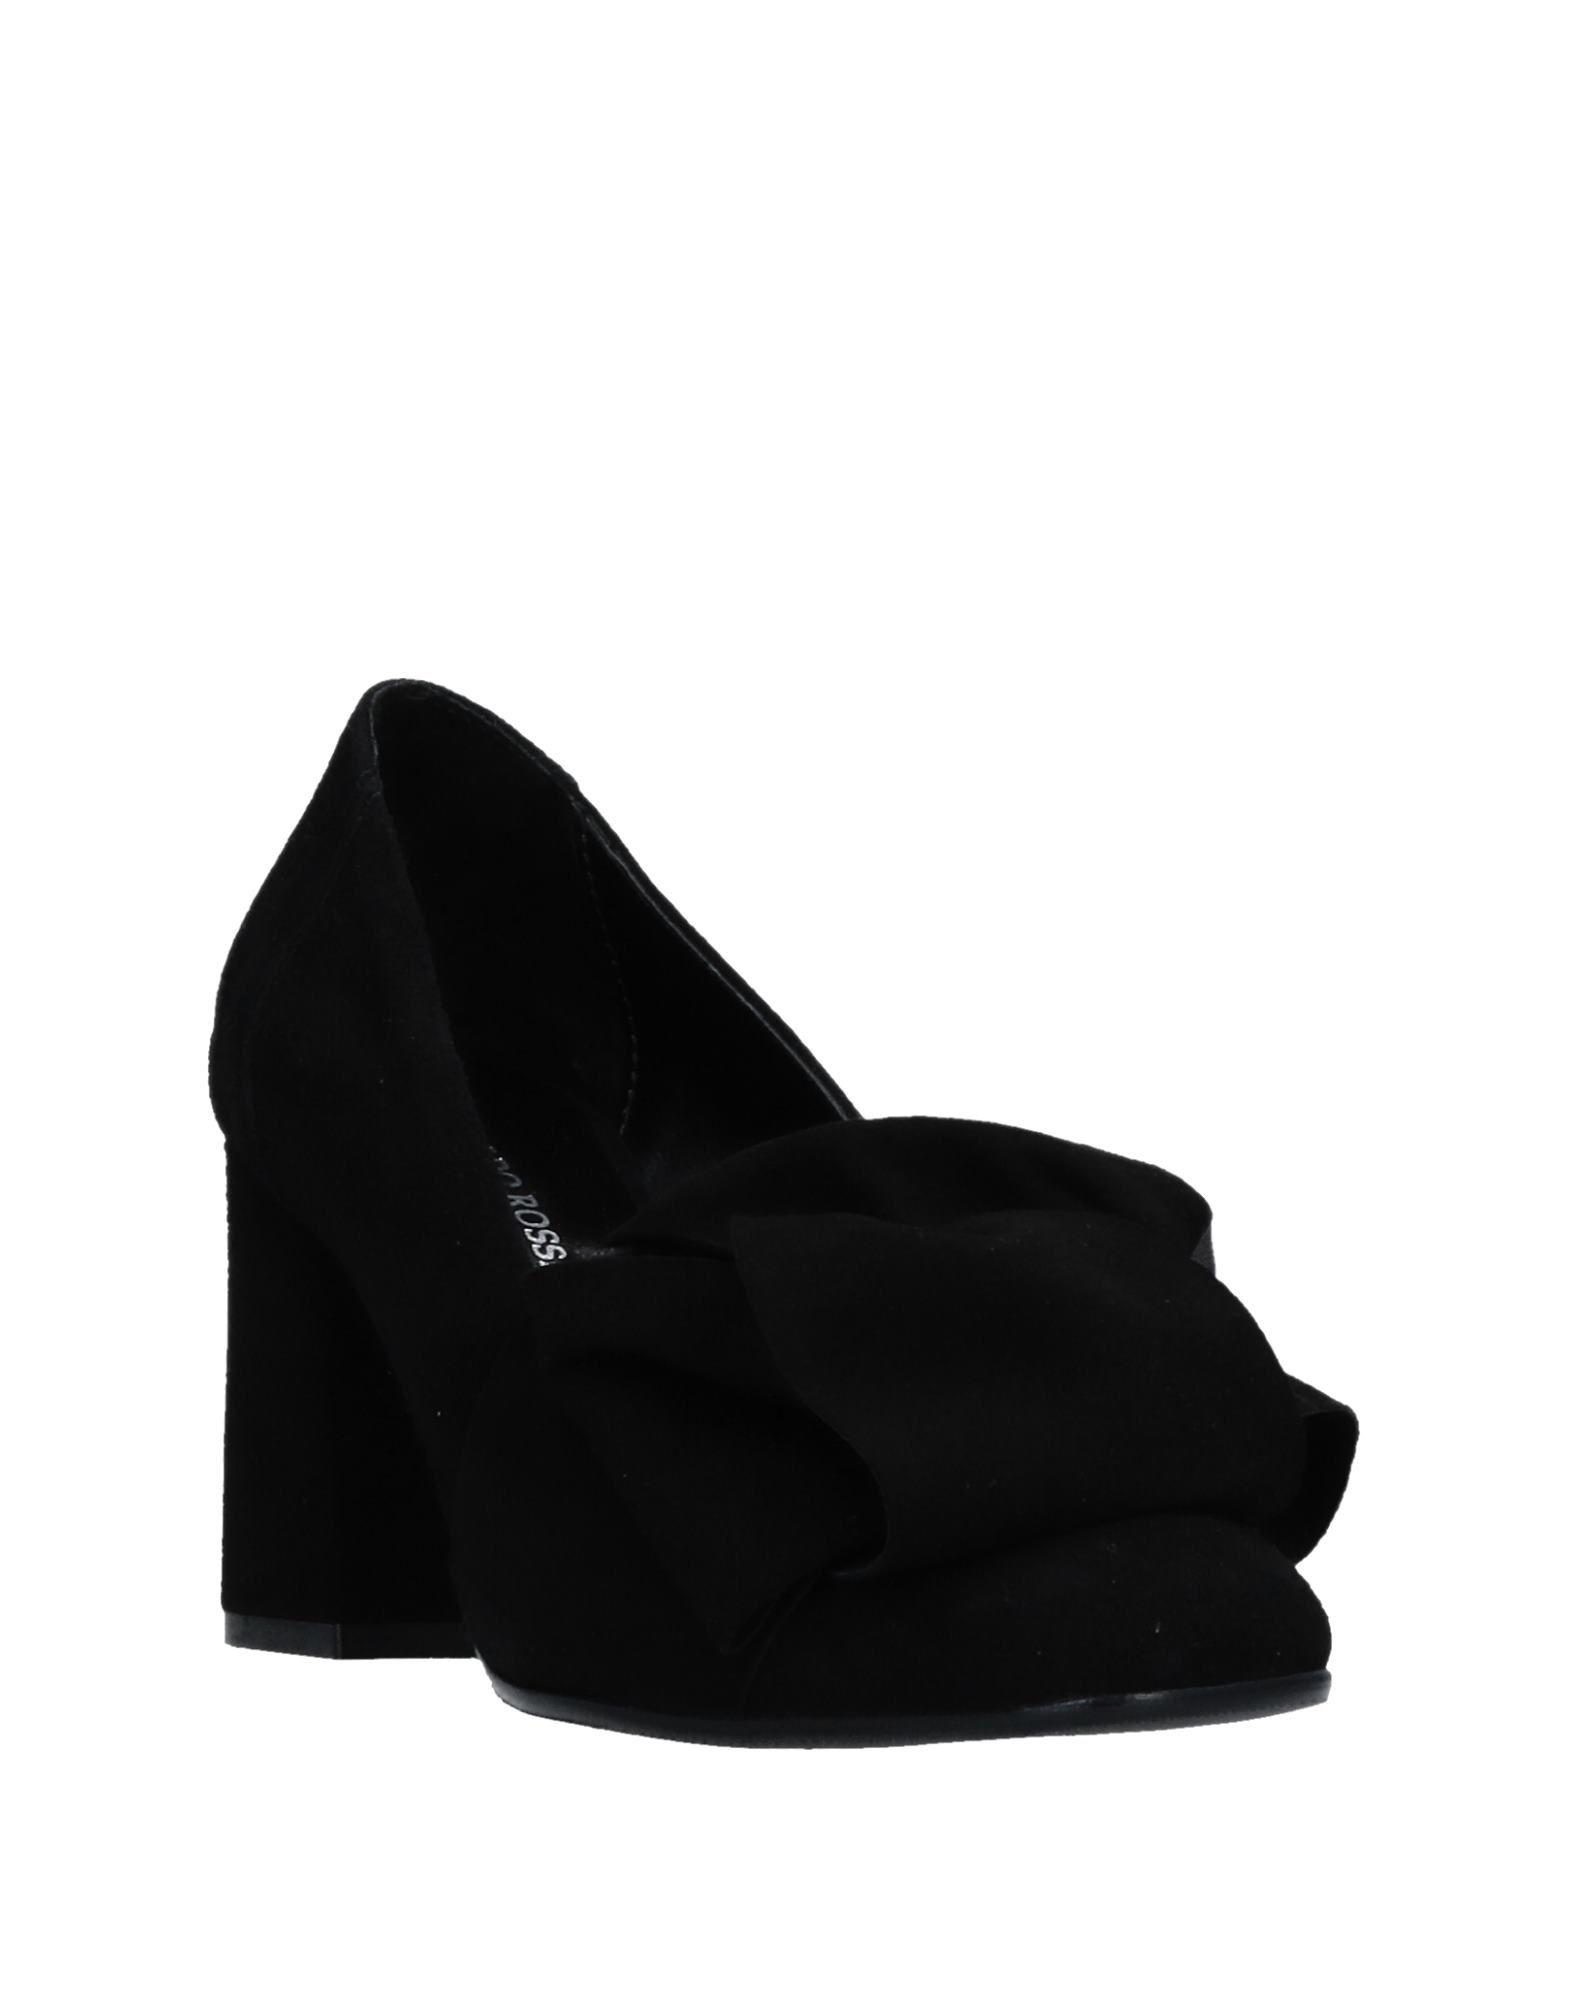 Osvaldo Rossi Pumps Pumps Rossi Damen  11507599CR Gute Qualität beliebte Schuhe 649263